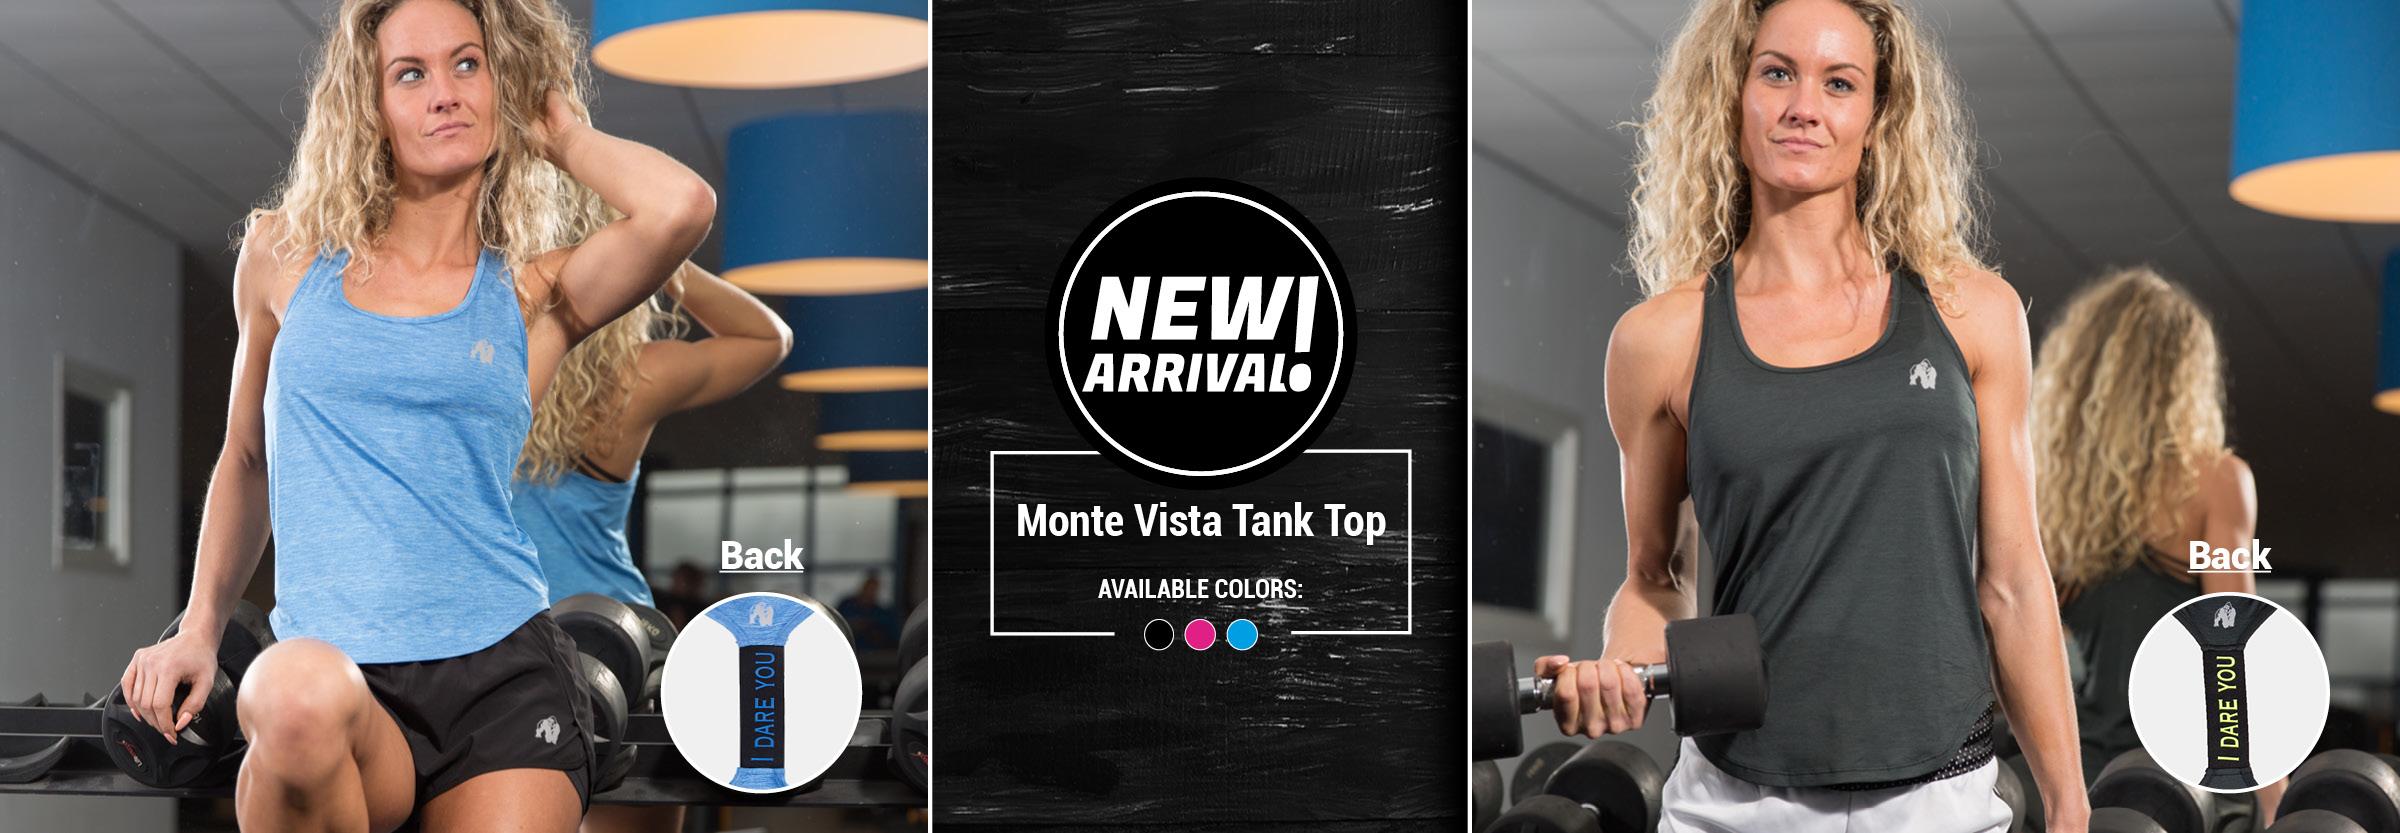 Monte Vista Tank Top